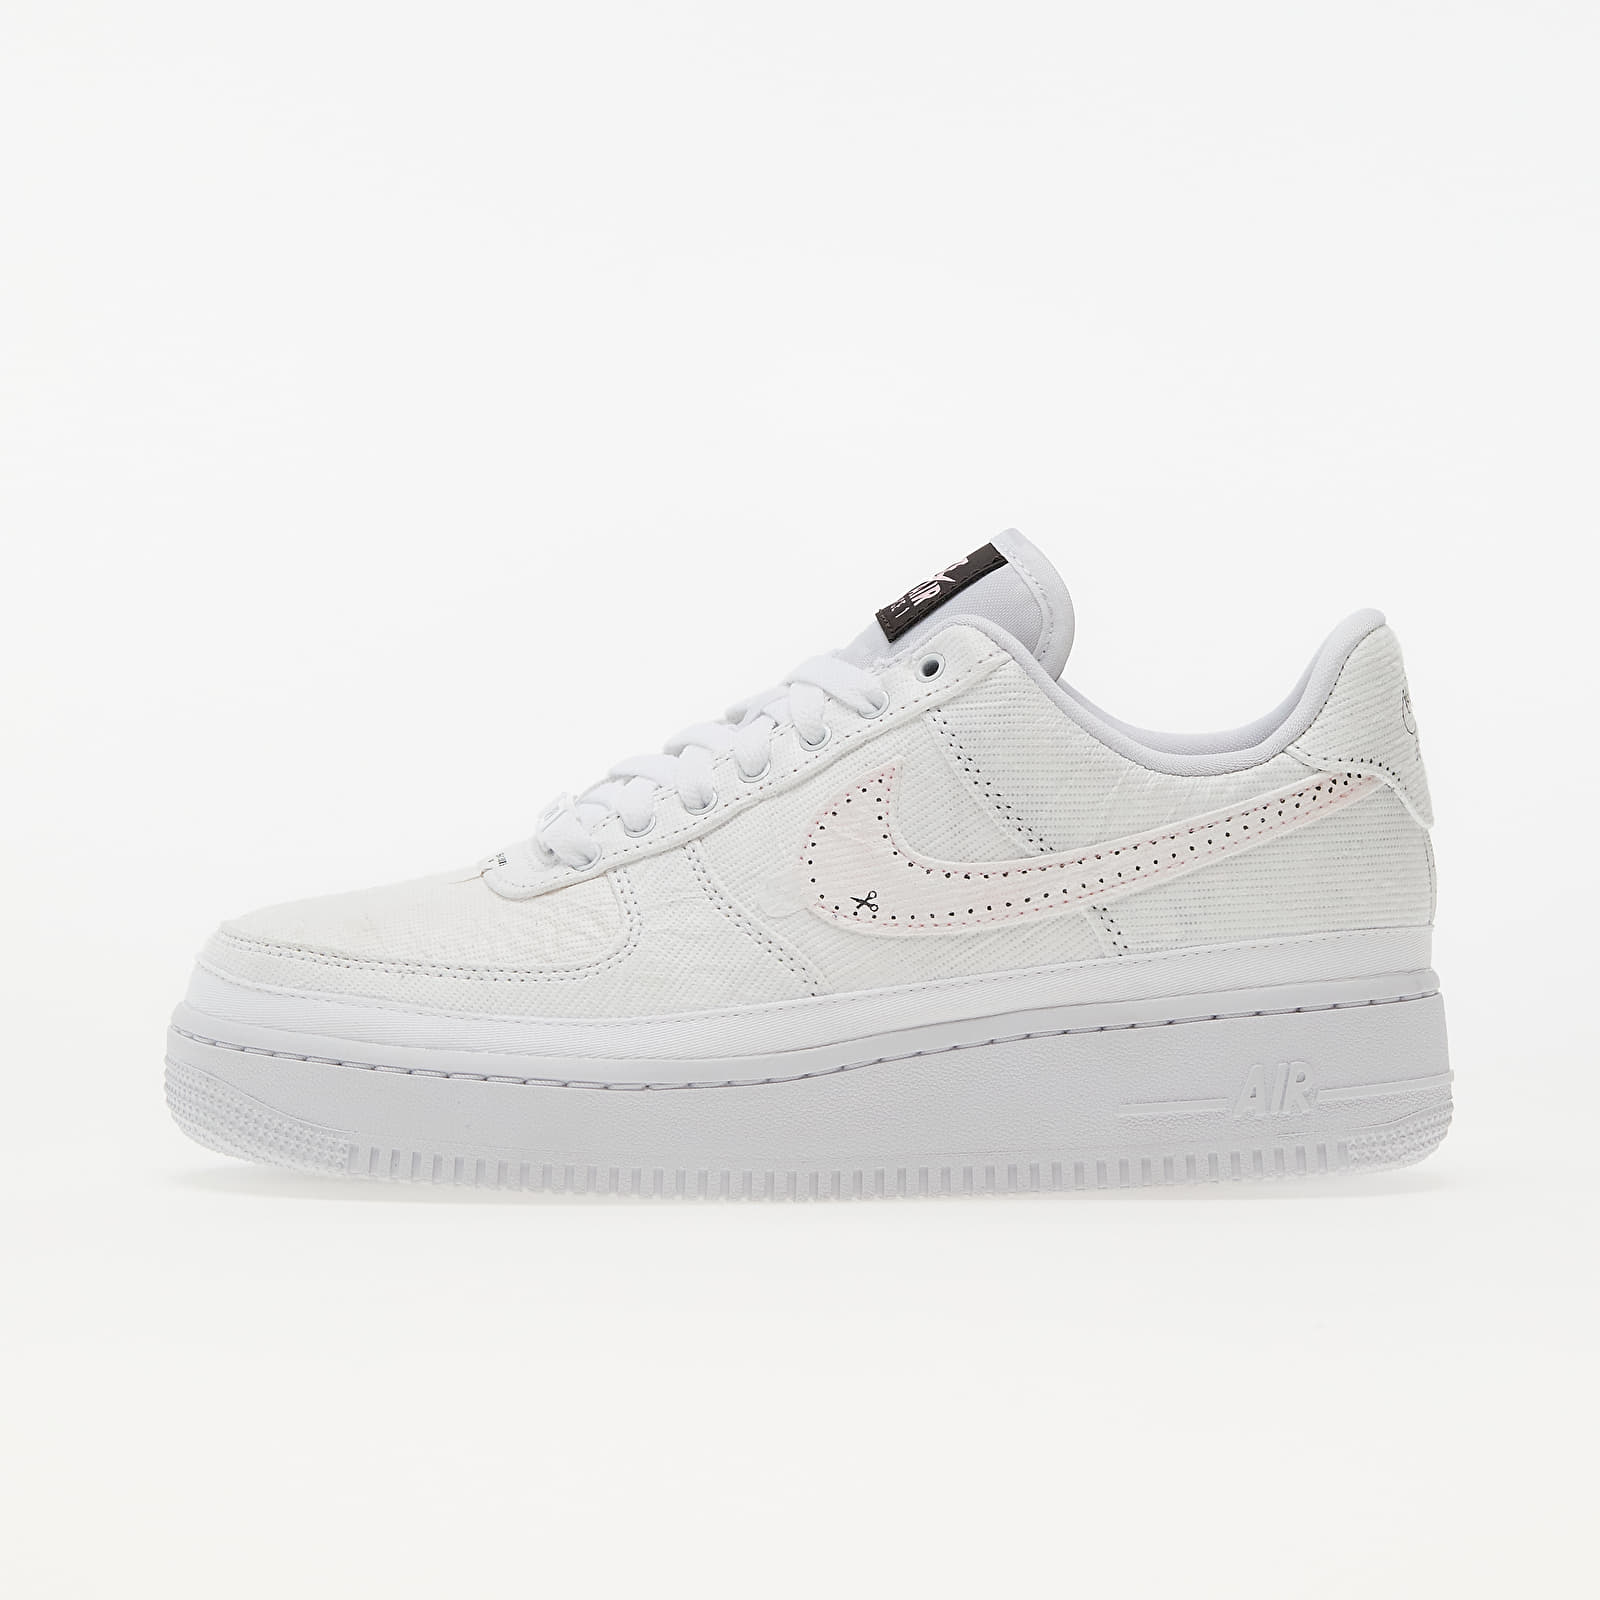 Nike Wmns Air Force 1 '07 Premium Fauna Brown/ Arctic Punch-Pale Vanilla EUR 39